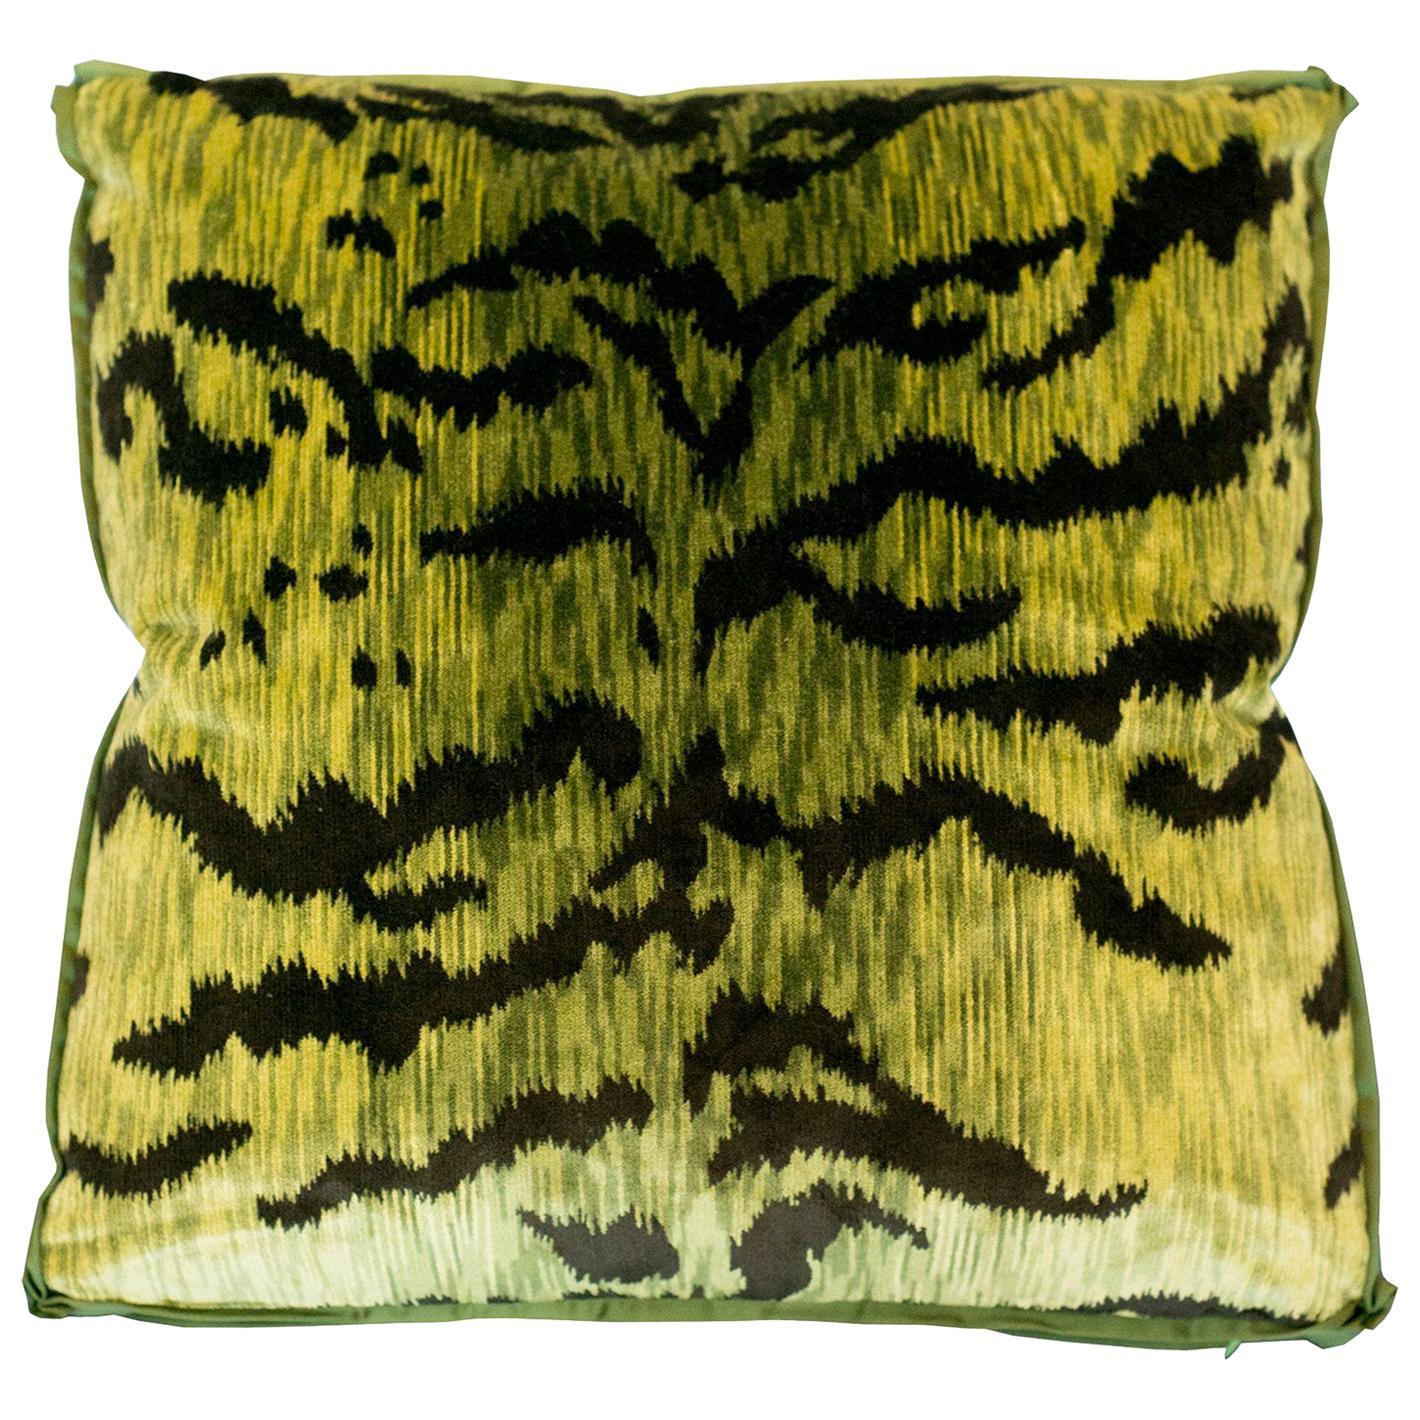 Chartreuse Green Bevilacqua Tiger Silk Velvet Pillows by Studio Maison Nurita